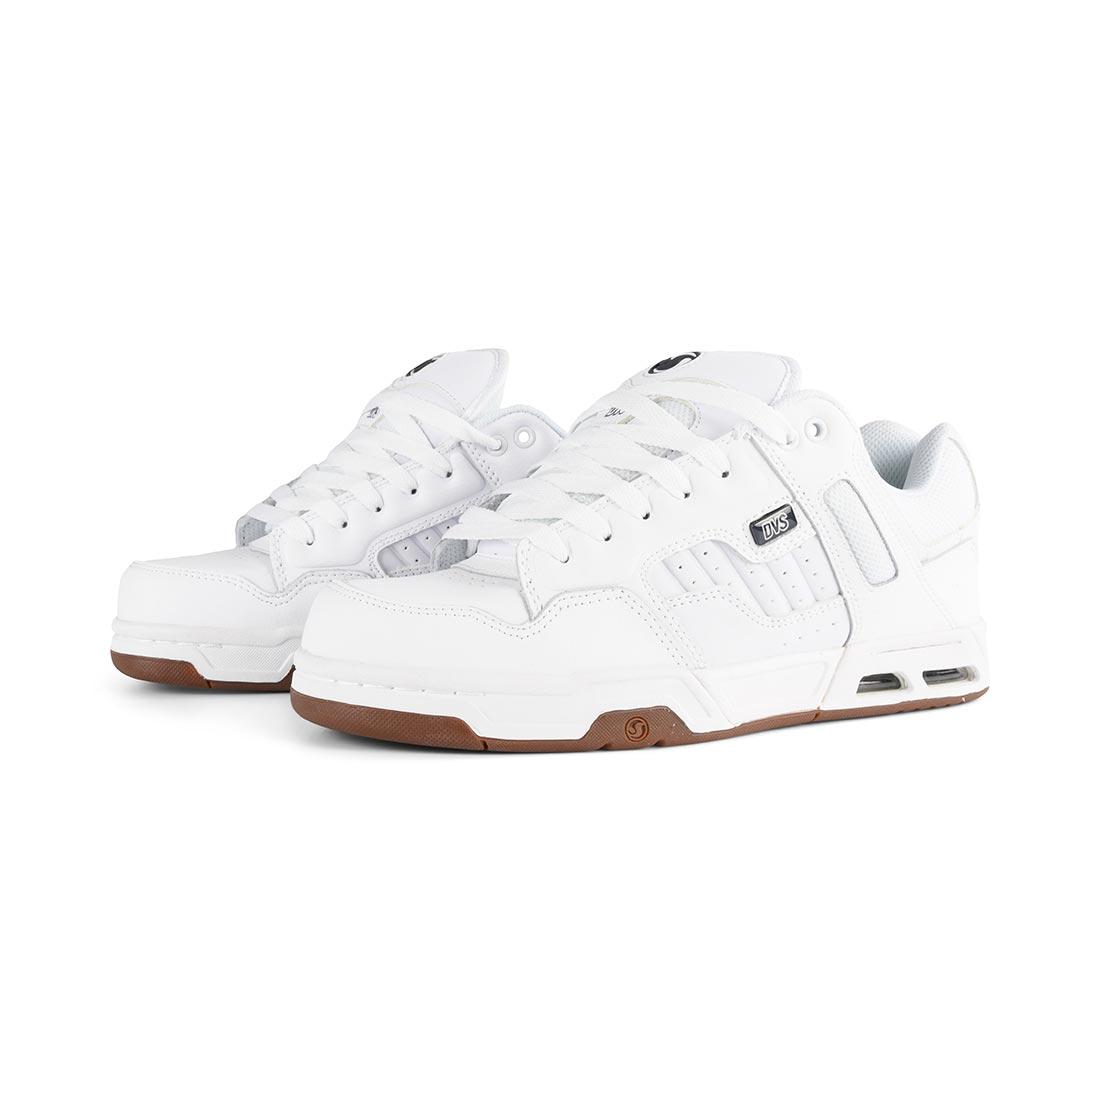 DVS Enduro Heir Shoes - White / Gum